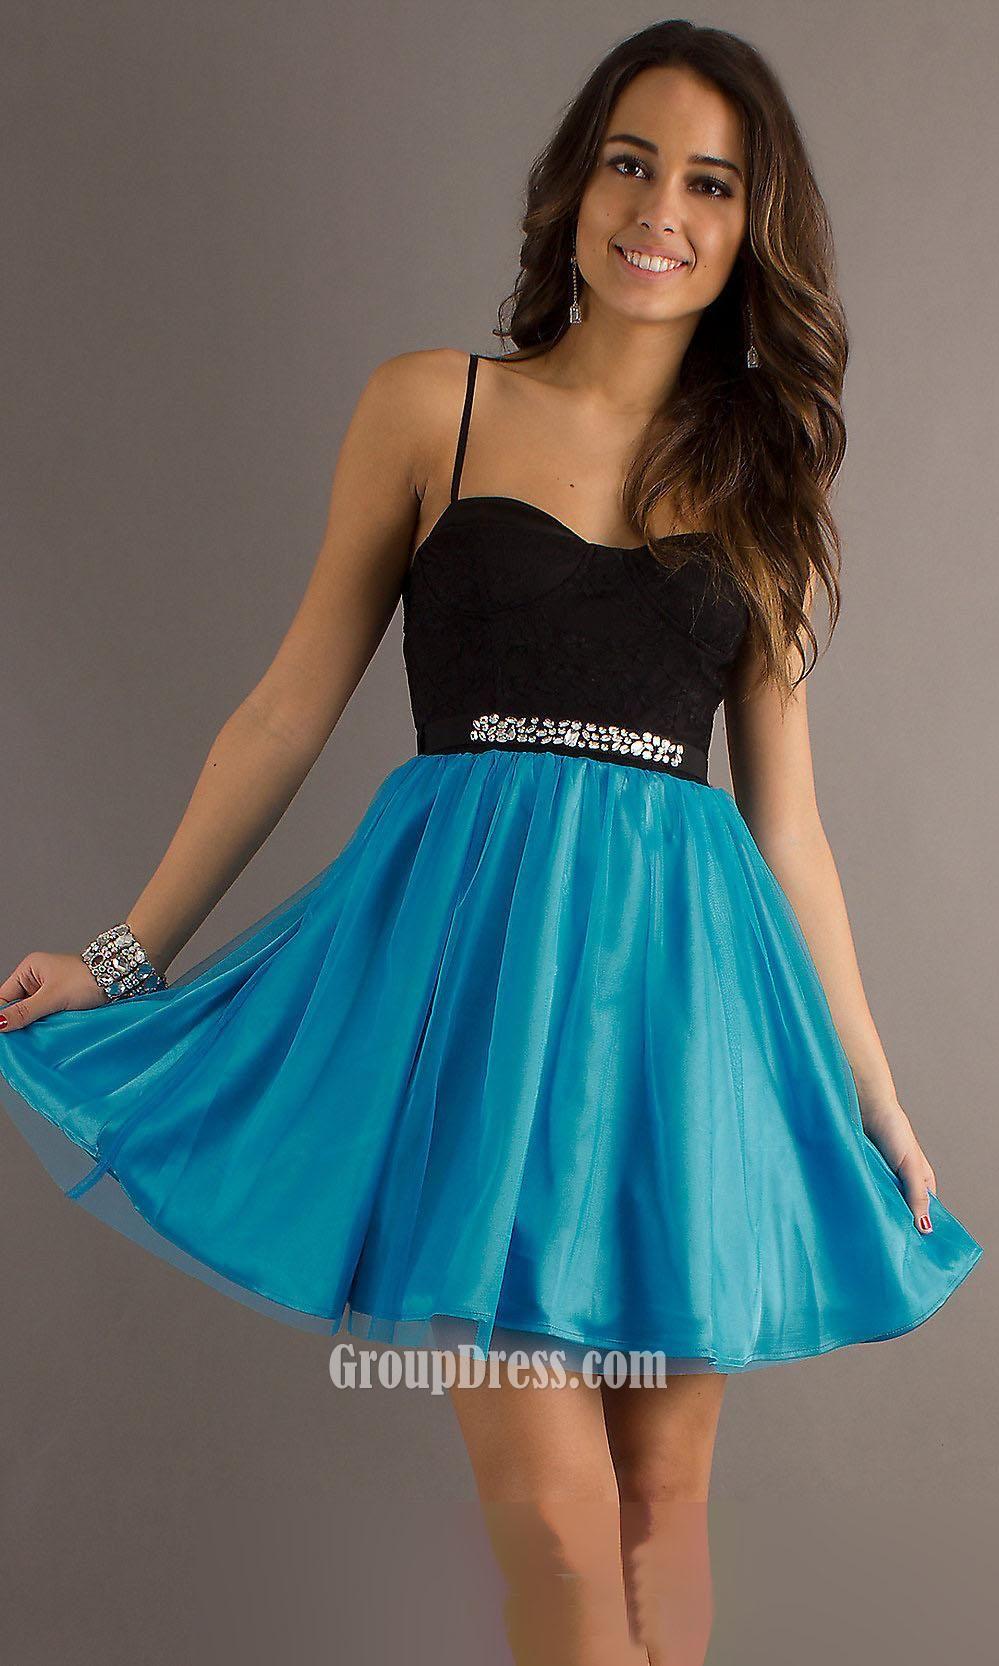 Short spaghetti strap prom dresses - Dress style